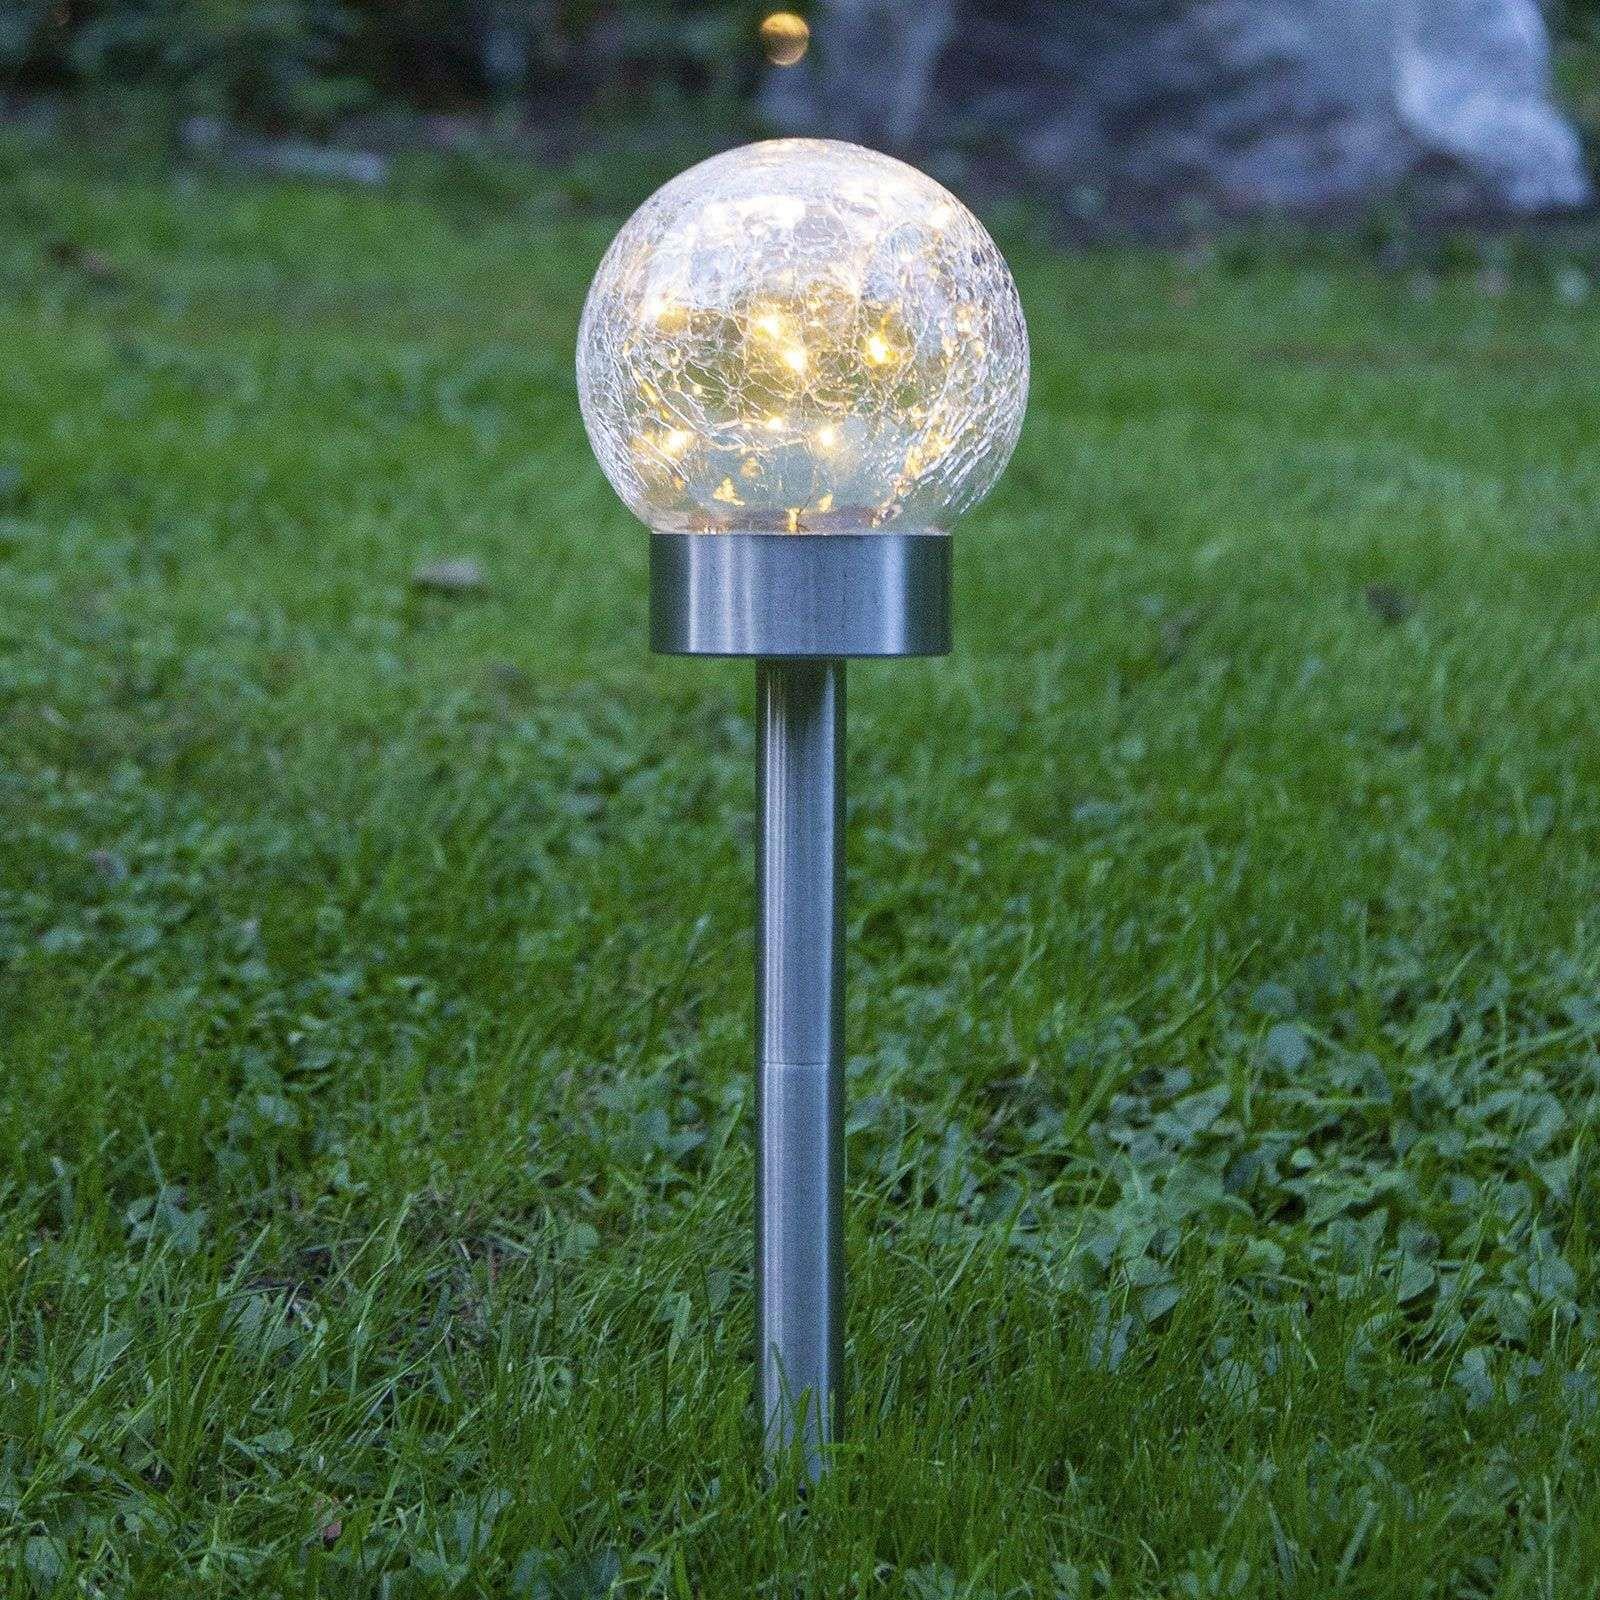 Lampe Solaire Led Glory 3 En 1 De Best Season Guirlande